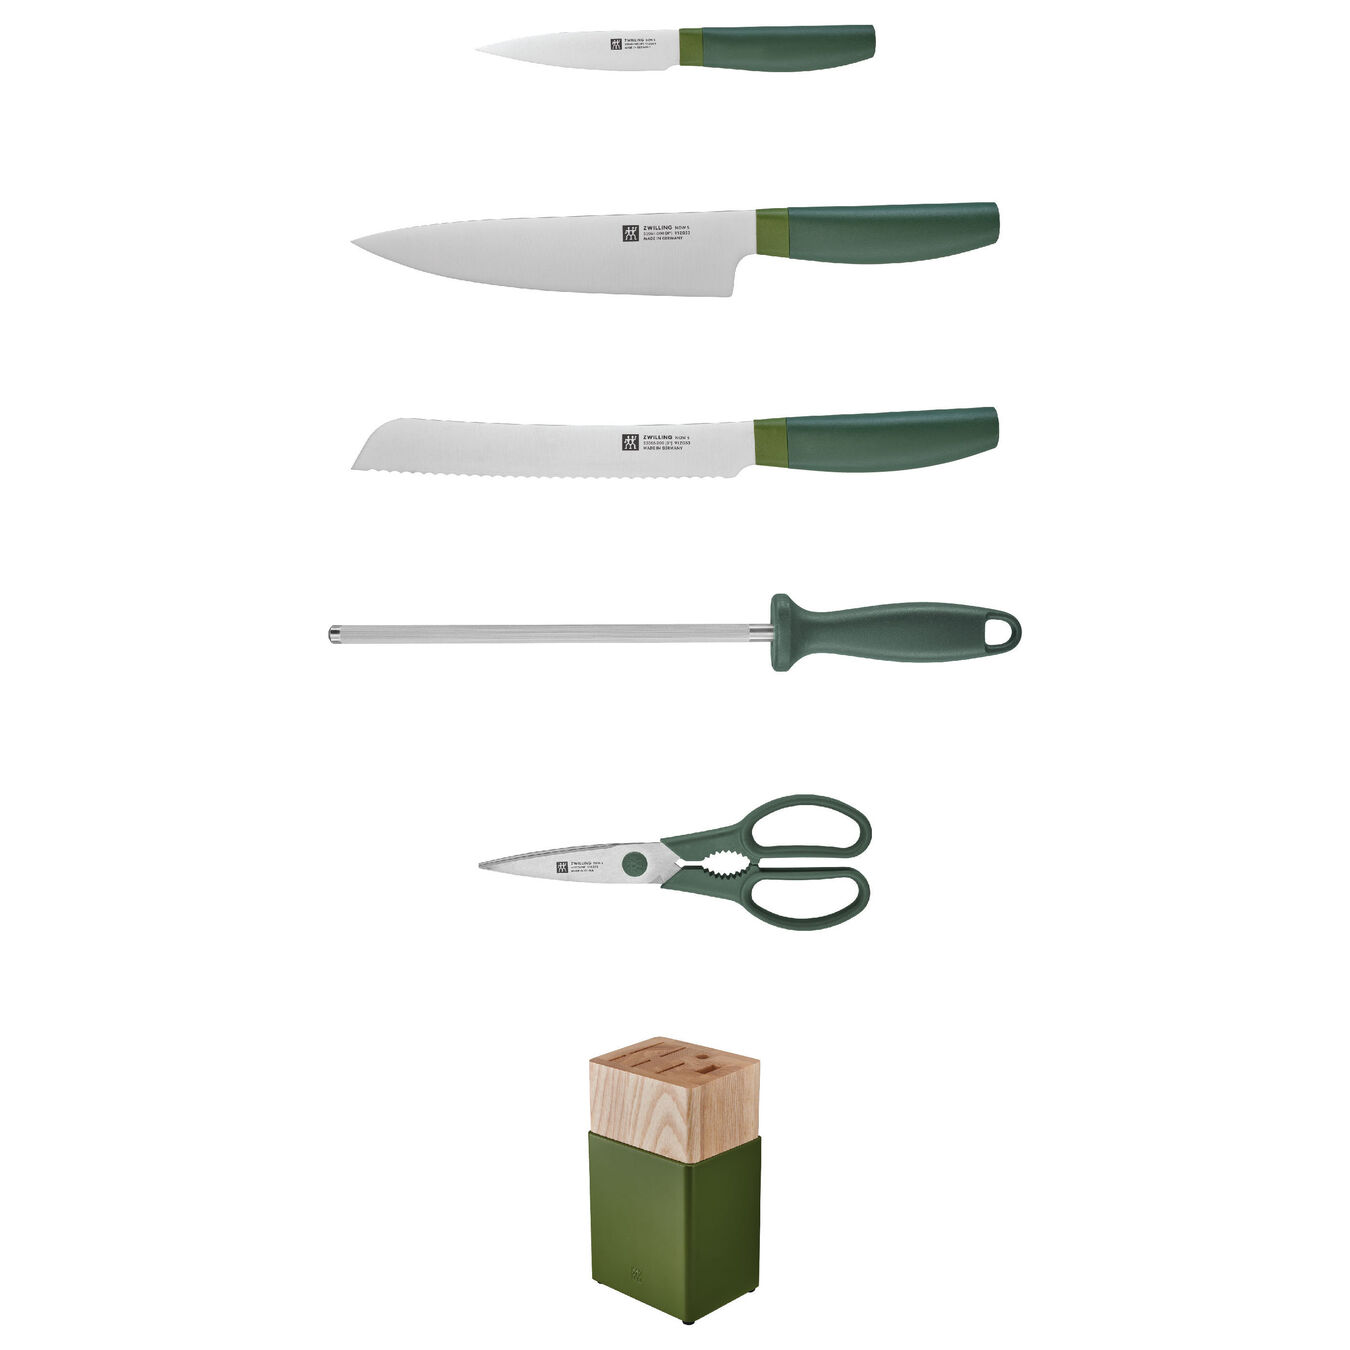 6-pc Knife Block Set - Lime Green,,large 2